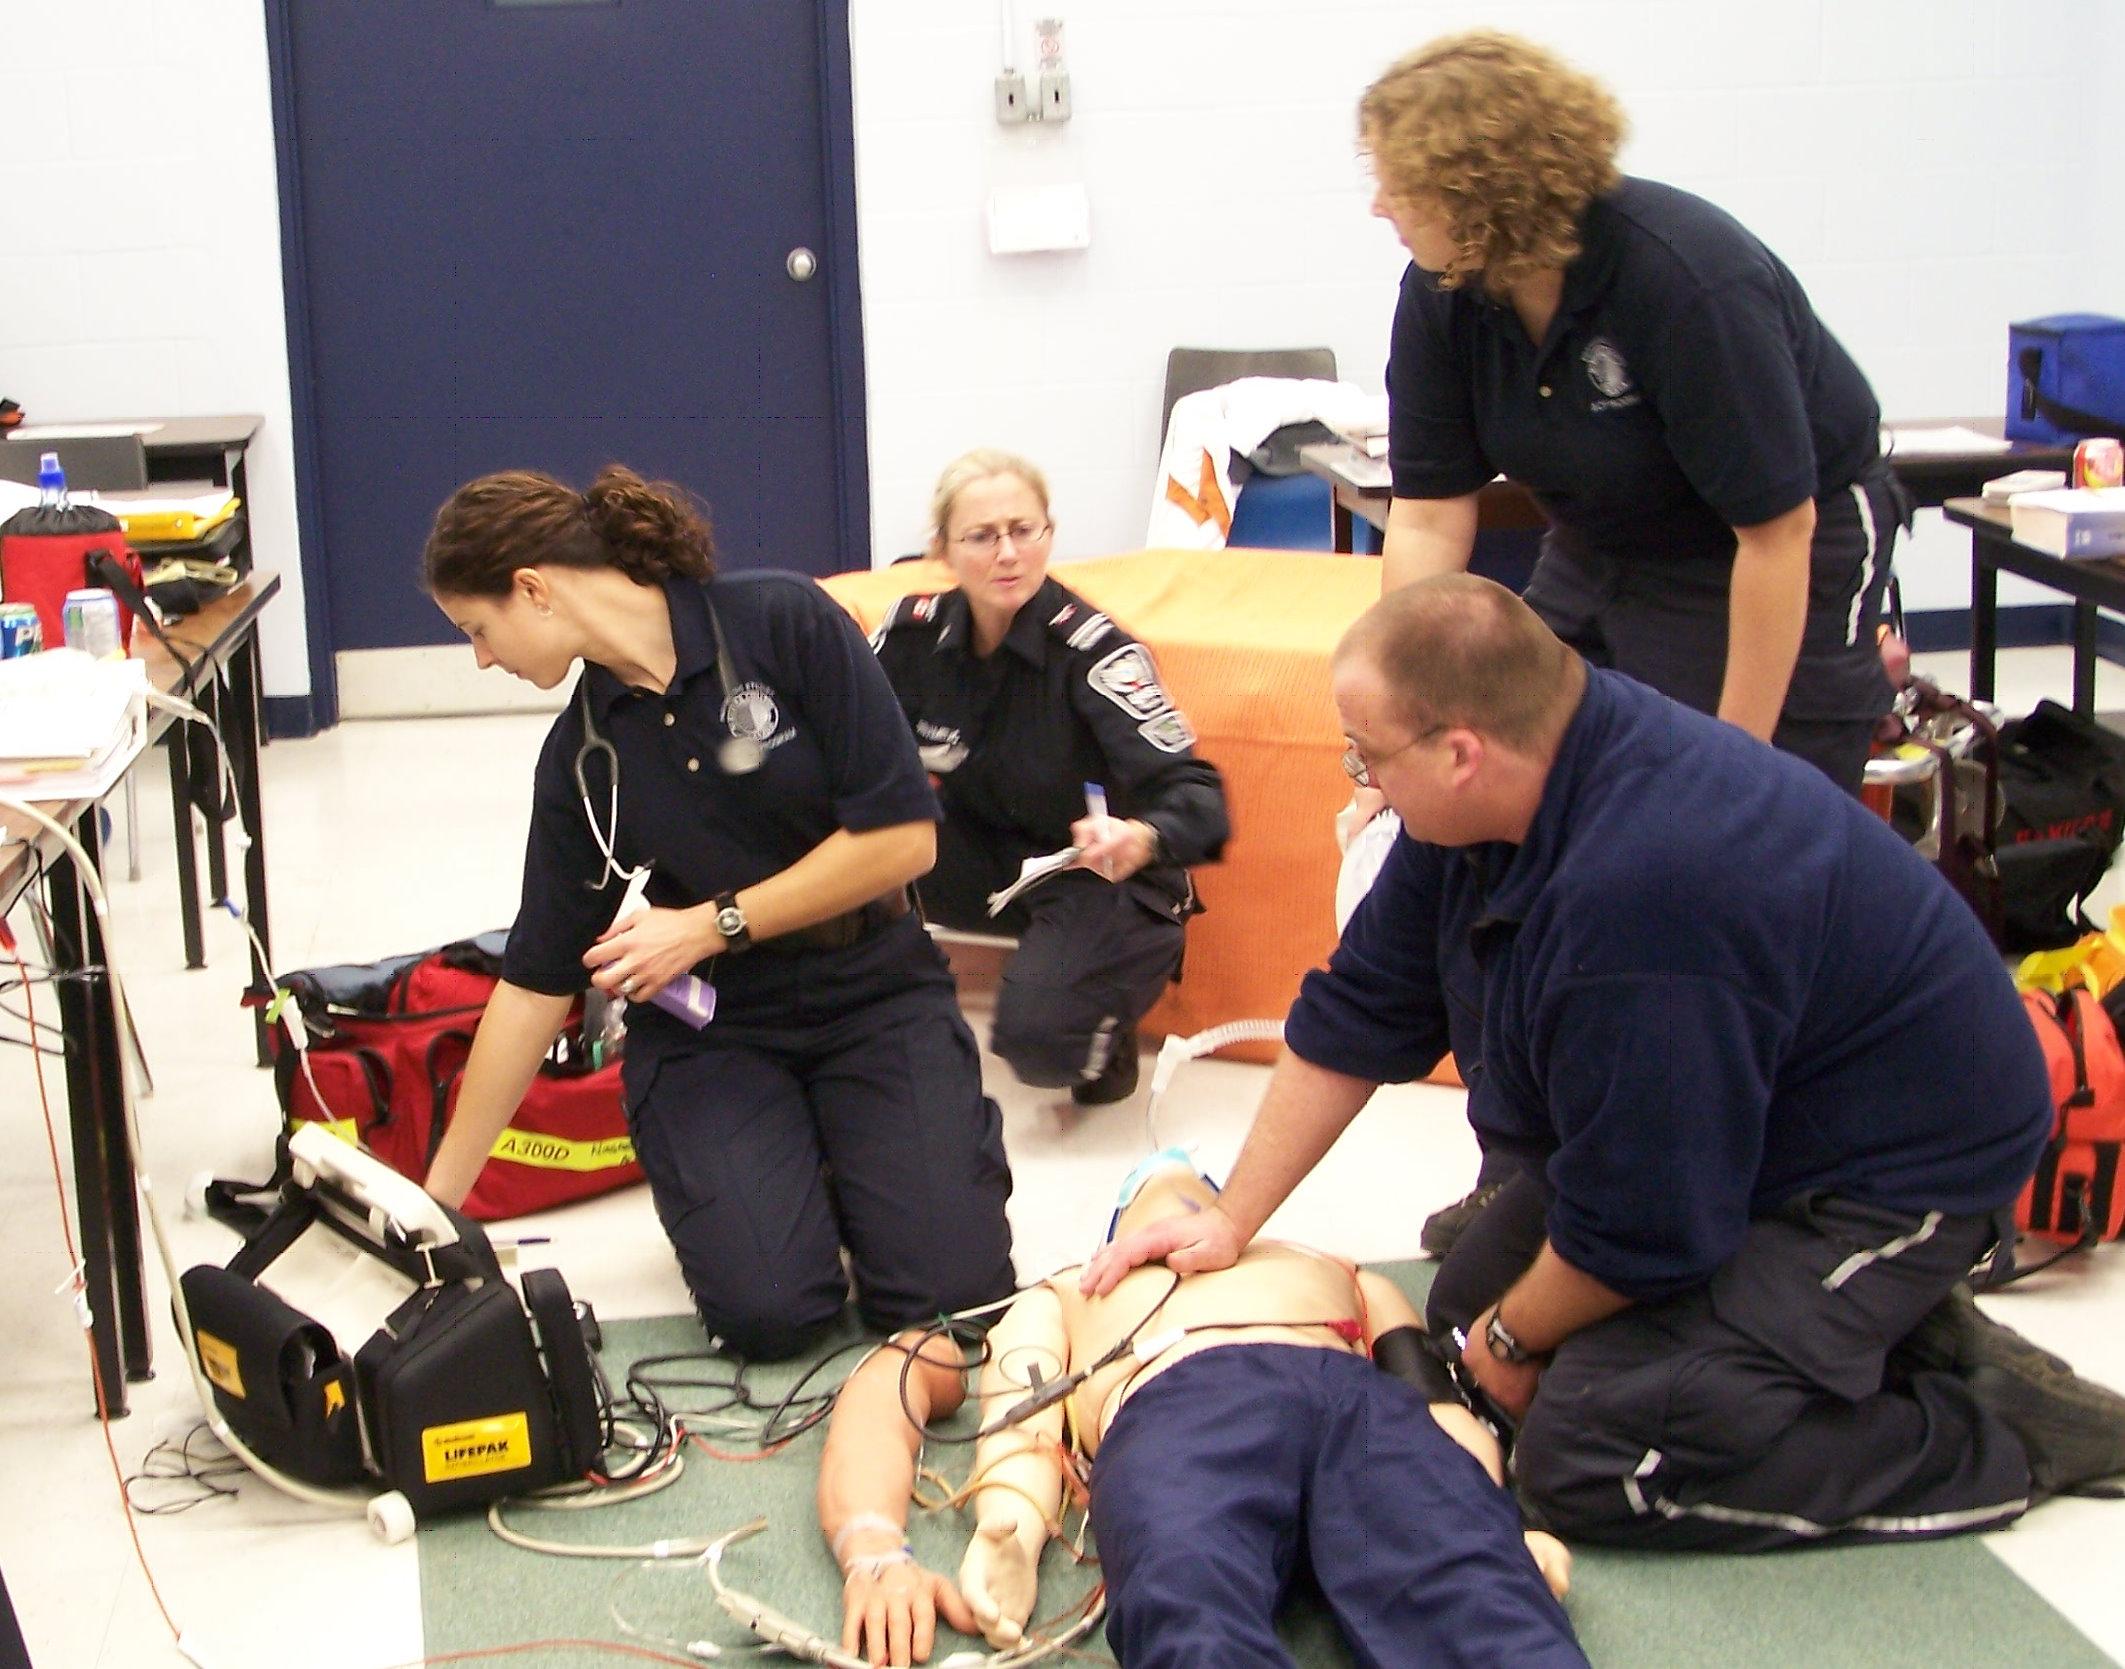 Paramedic dummywork